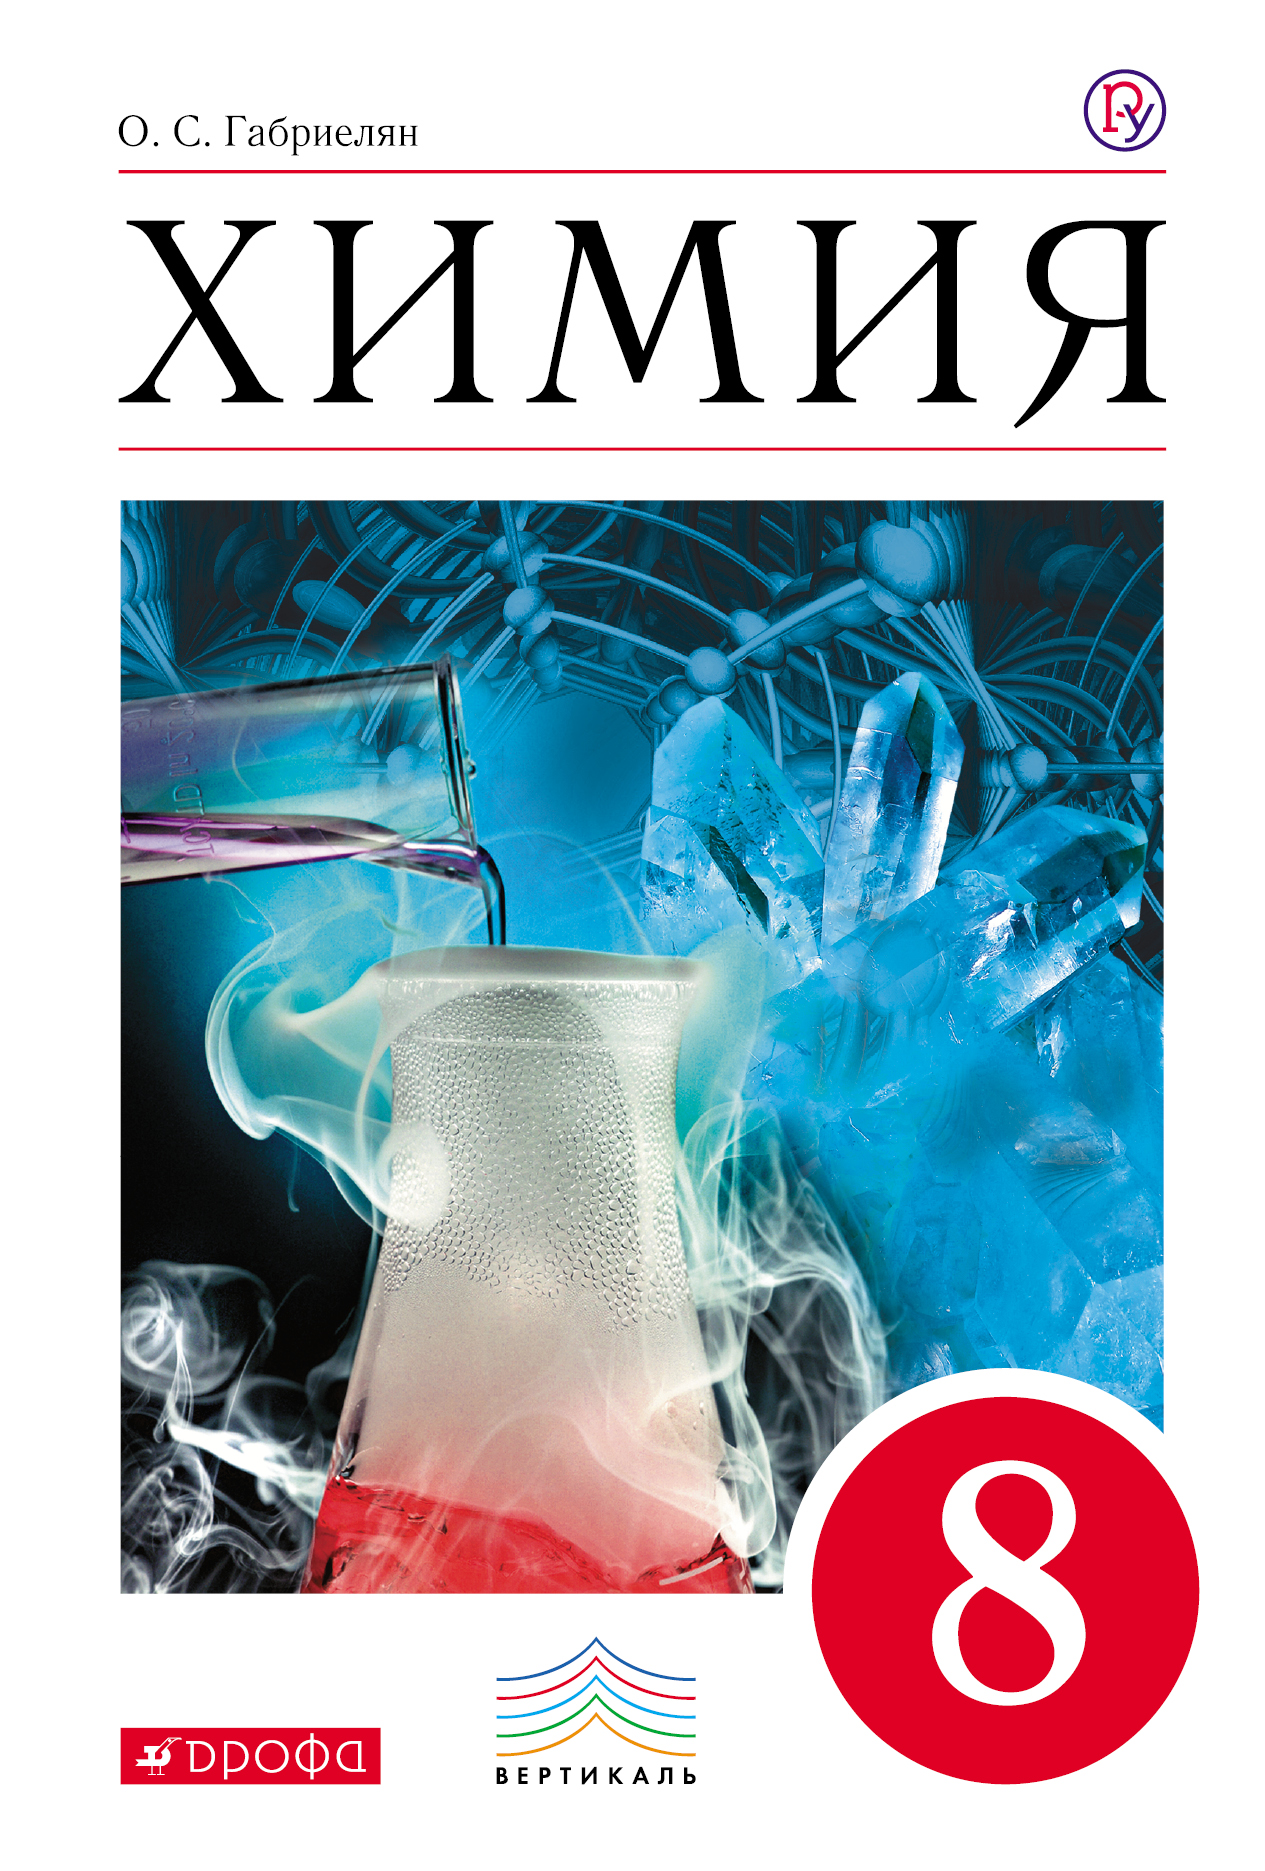 Габриелян О.С. Химия. 8 класс. Учебник о с габриелян химия 8 класс